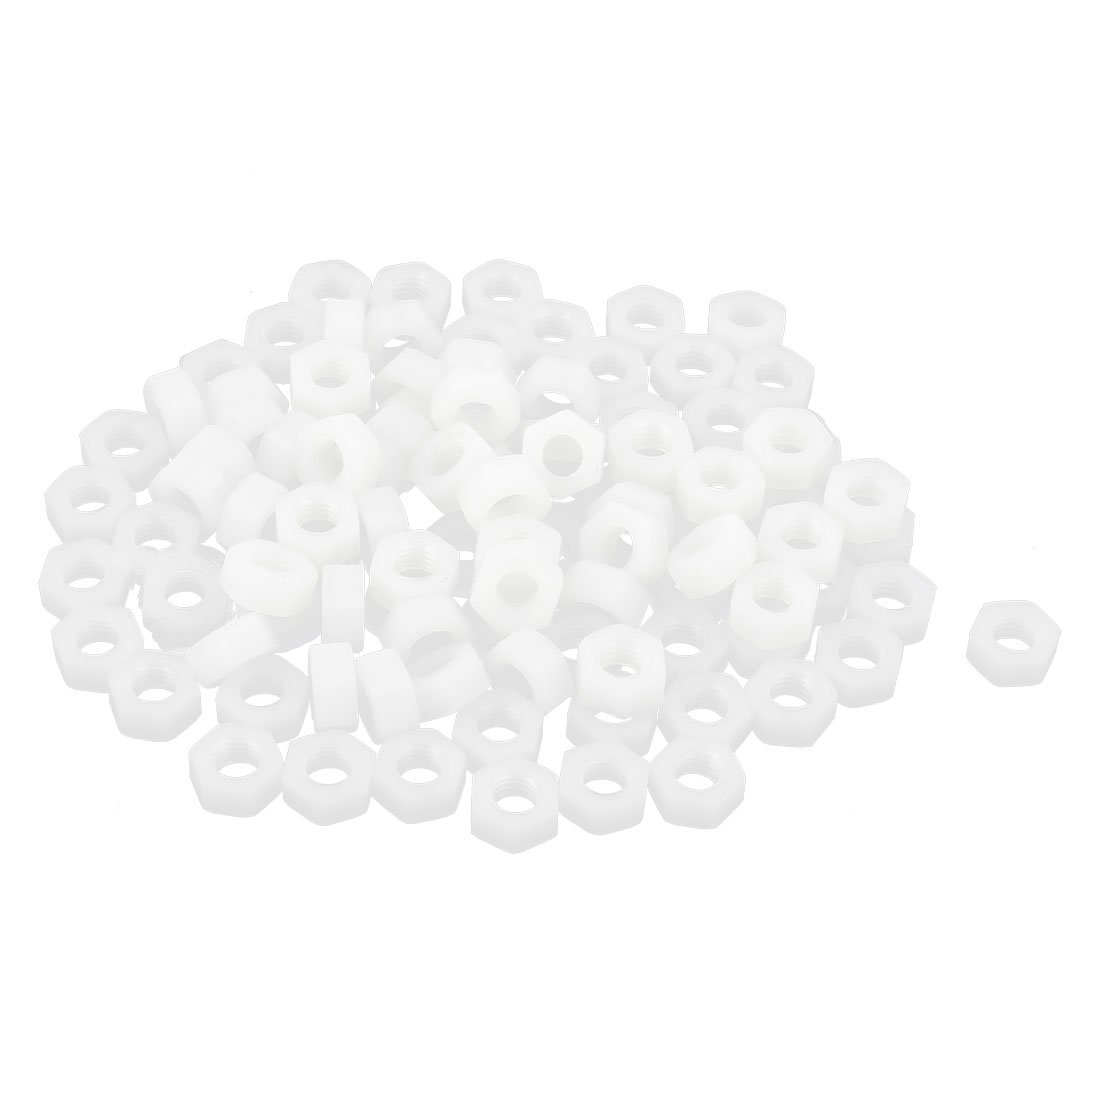 100pcs Metric M6x1mm Nylon Hexagon Fastener Hex Full Nuts White